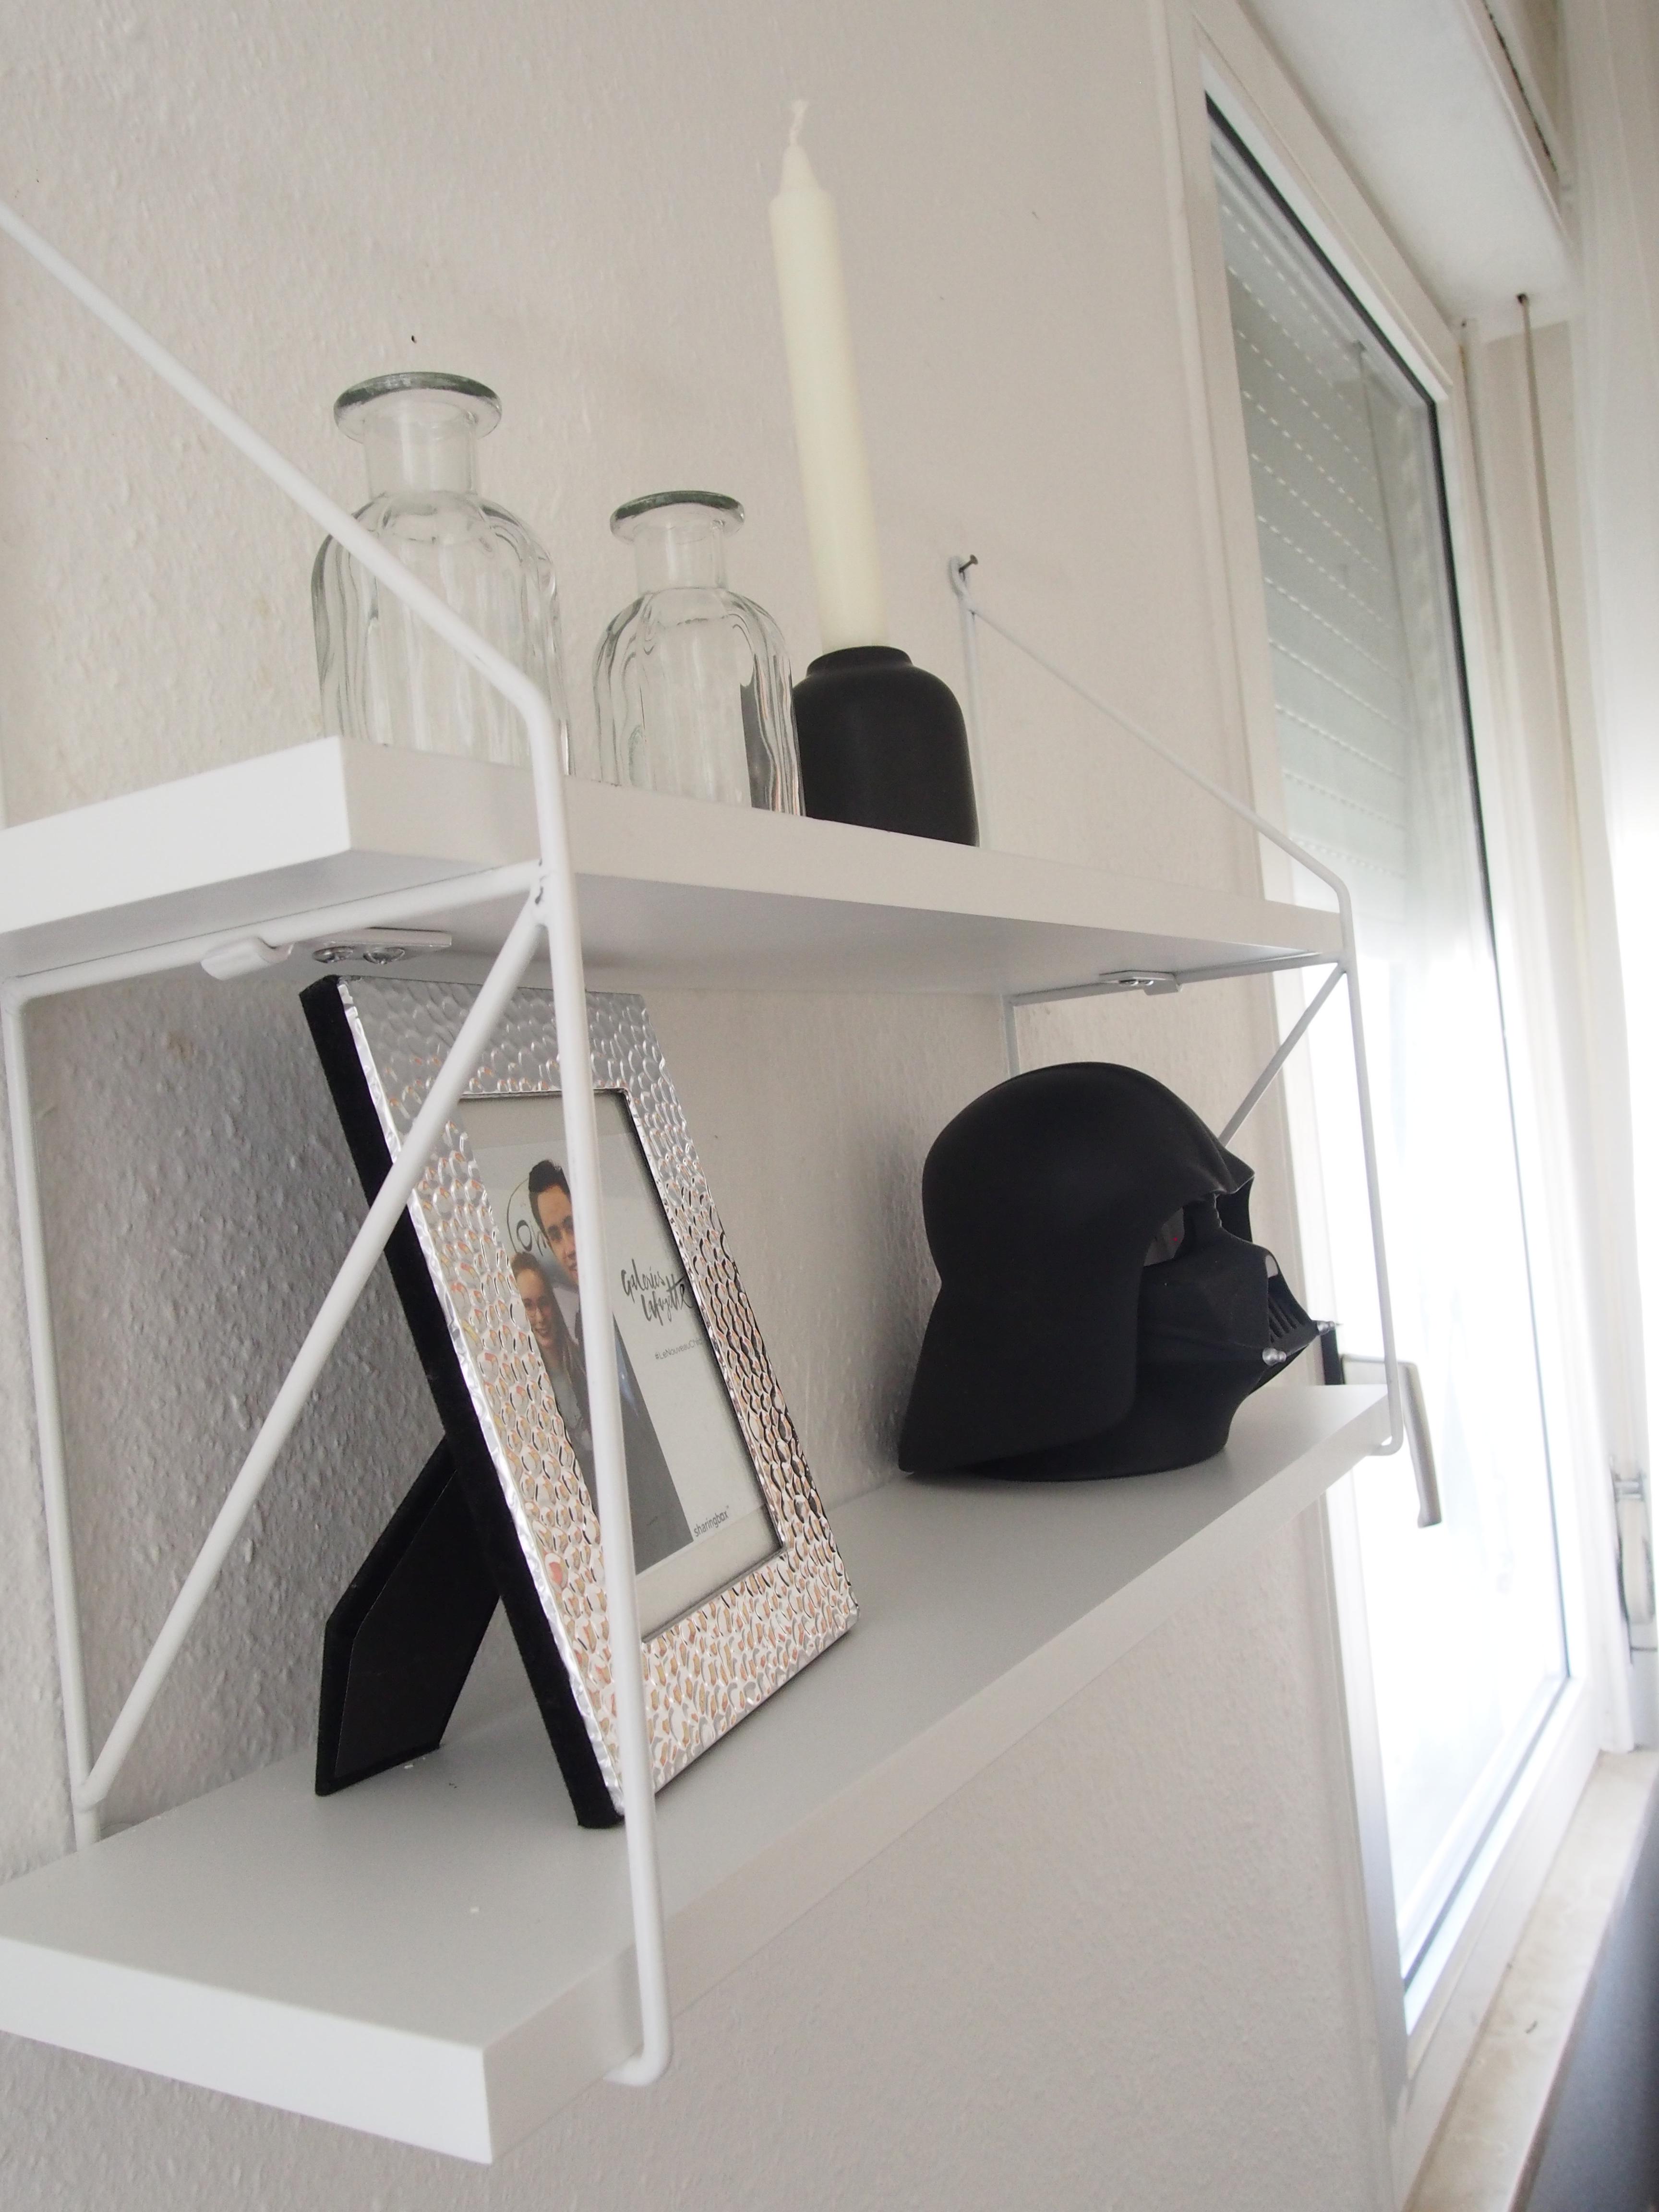 deco chez les soeurs sostrene grene. Black Bedroom Furniture Sets. Home Design Ideas